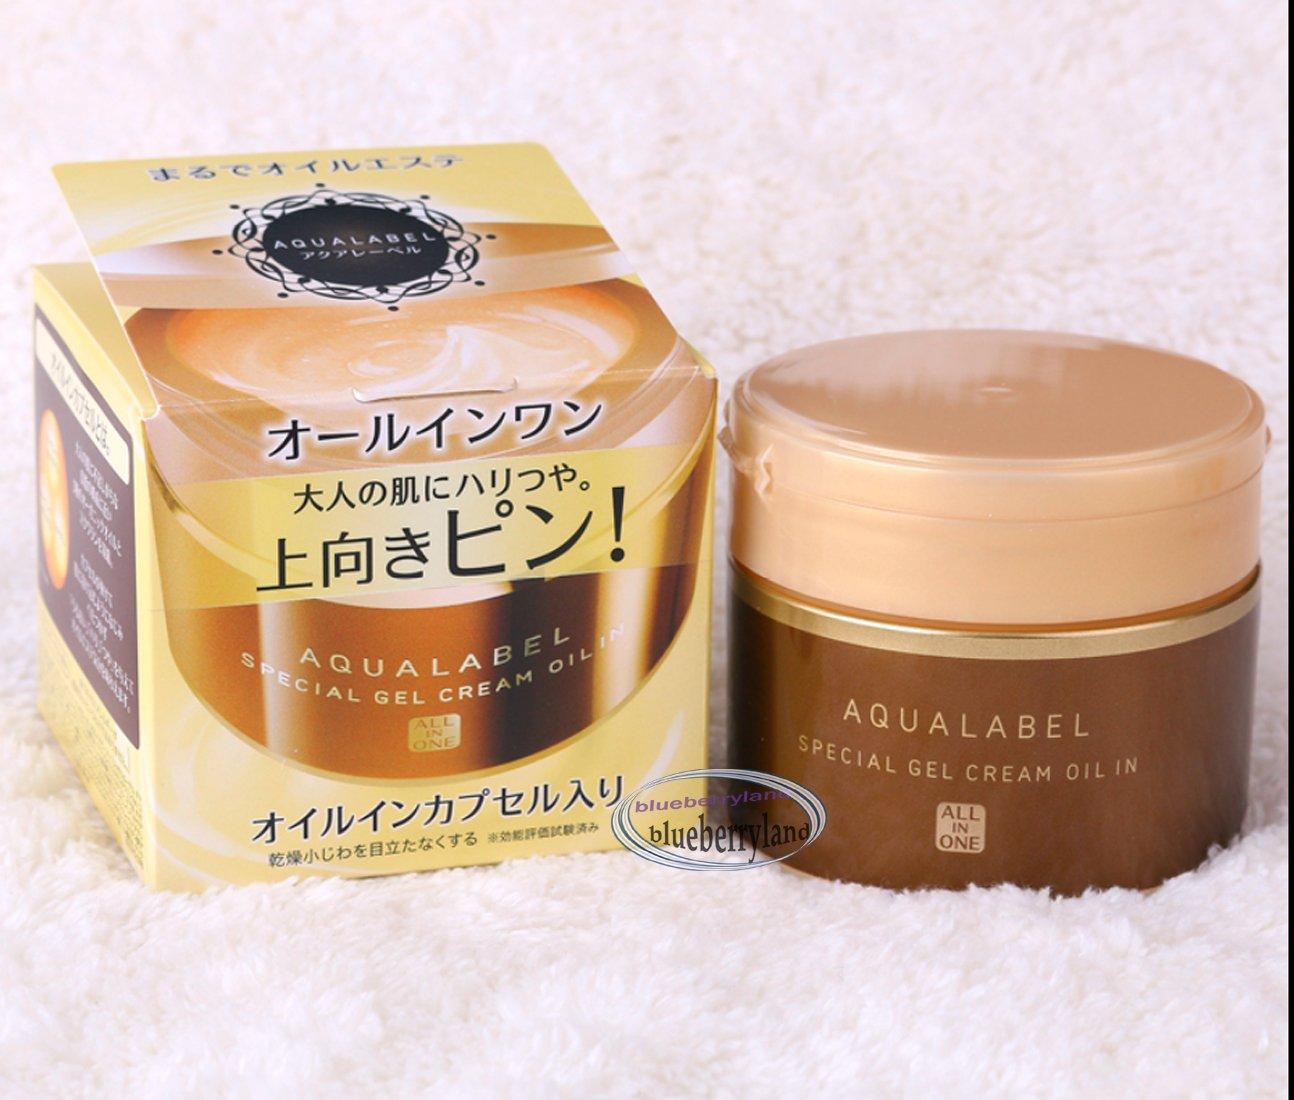 Shiseido Aqualabel Special Face Facial Gel Cream Oil In Anti-aging 90g